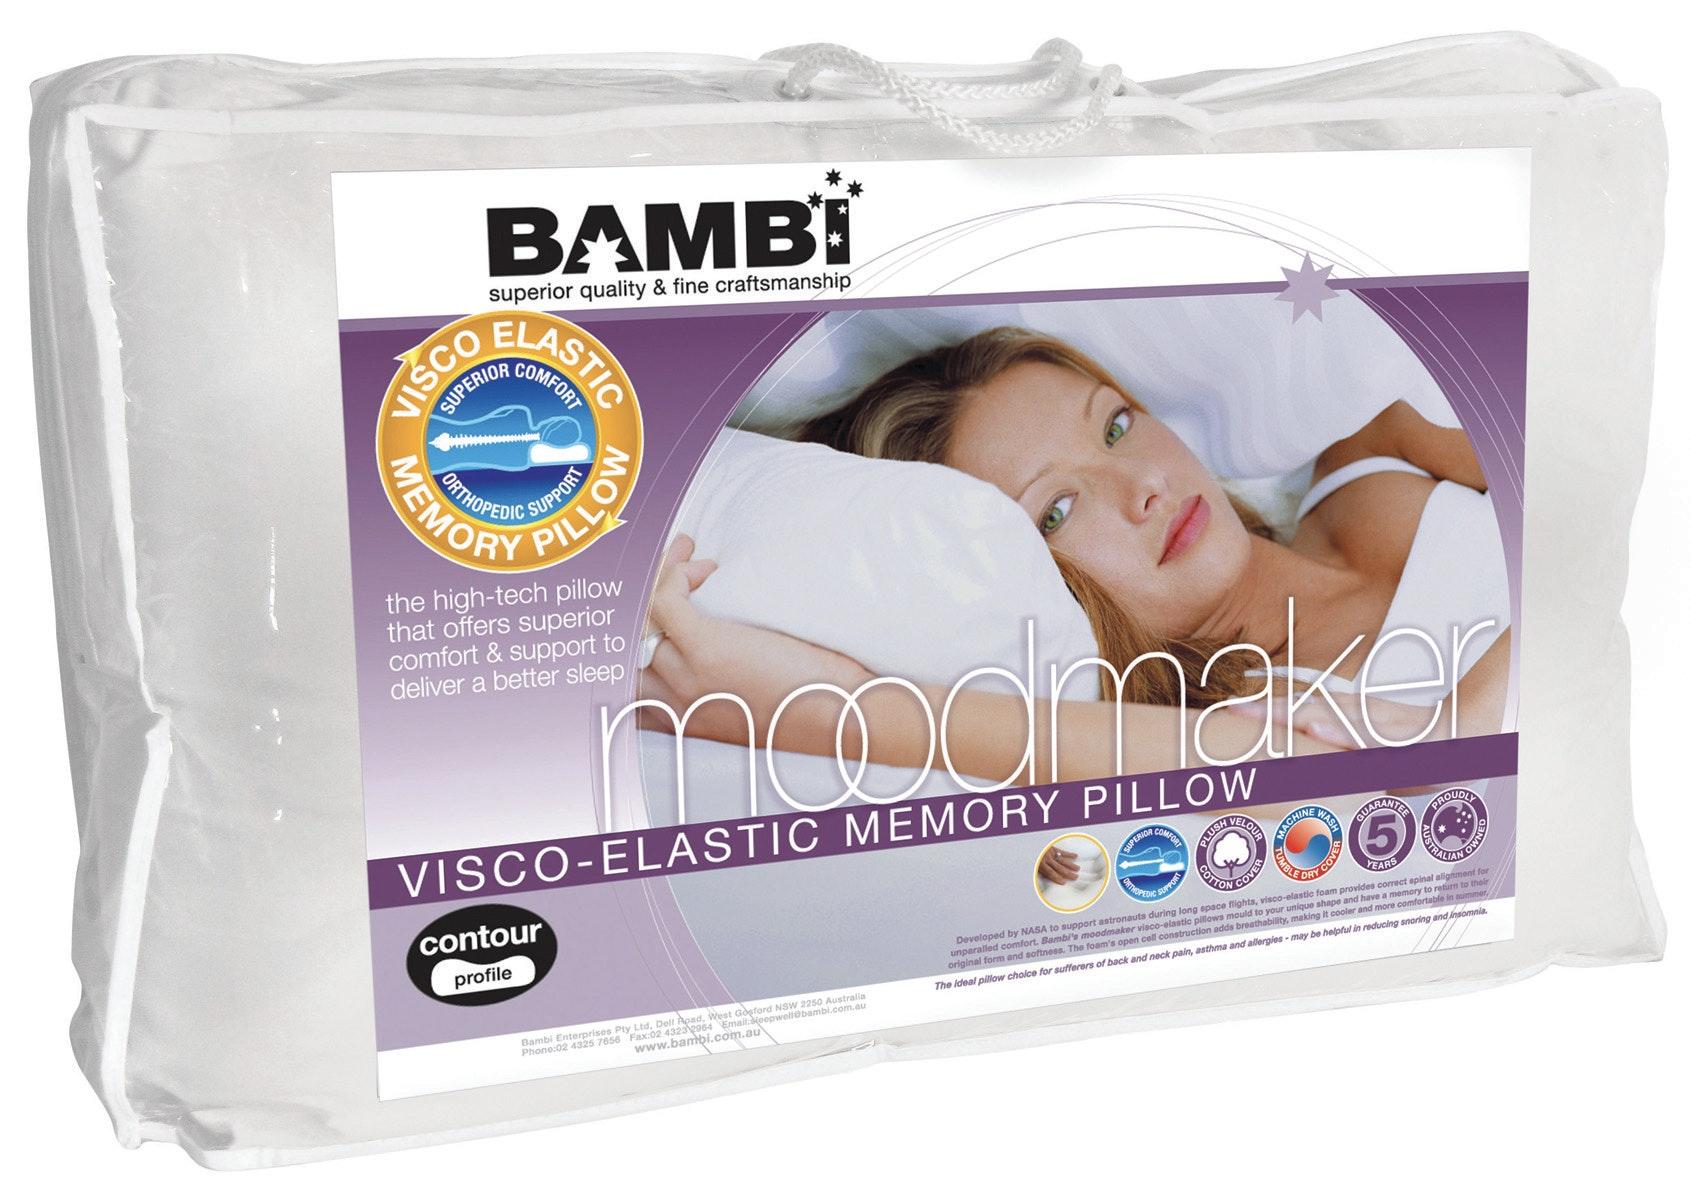 Visco Elastic Pillow by Bambi